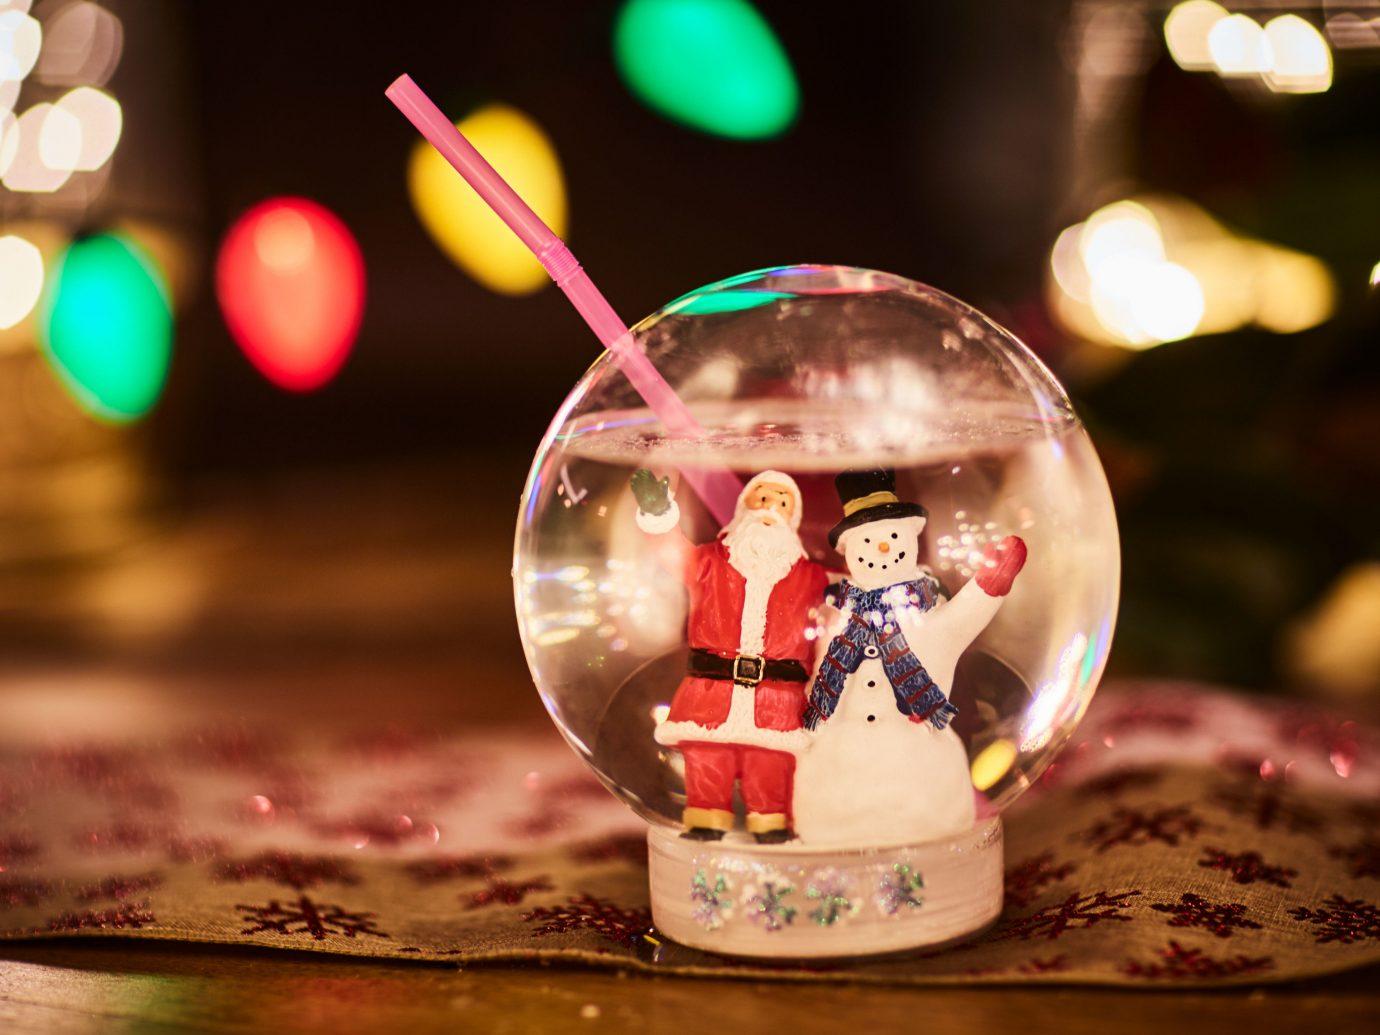 Food + Drink color indoor Christmas lighting sweetness Drink